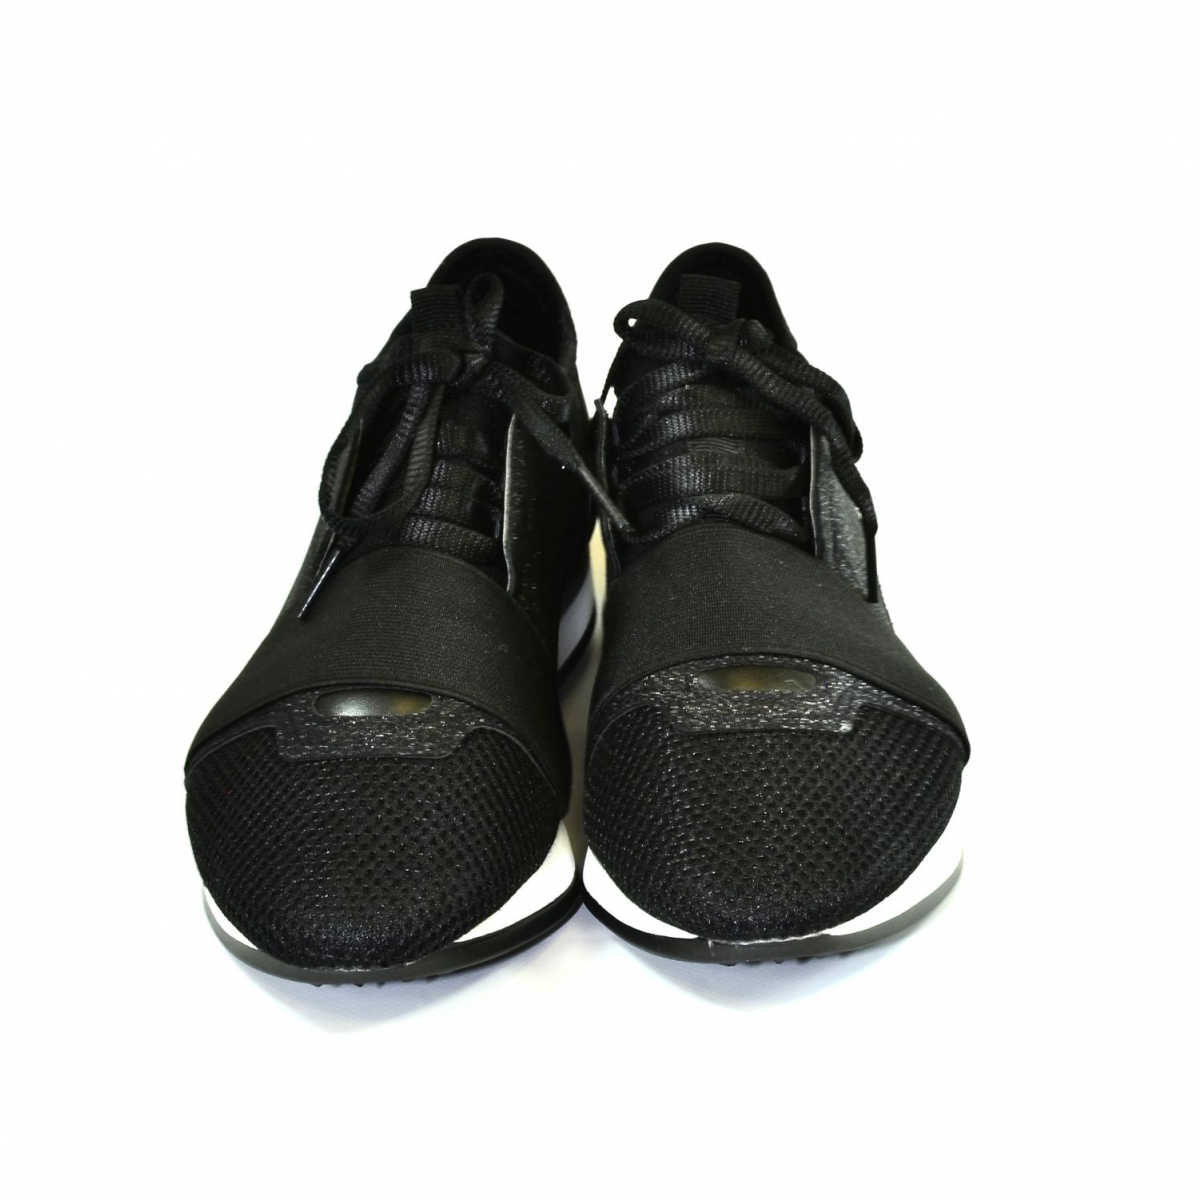 dd57fbc4cc97d Dámske čierne botasky BRIEN | Johnc.sk